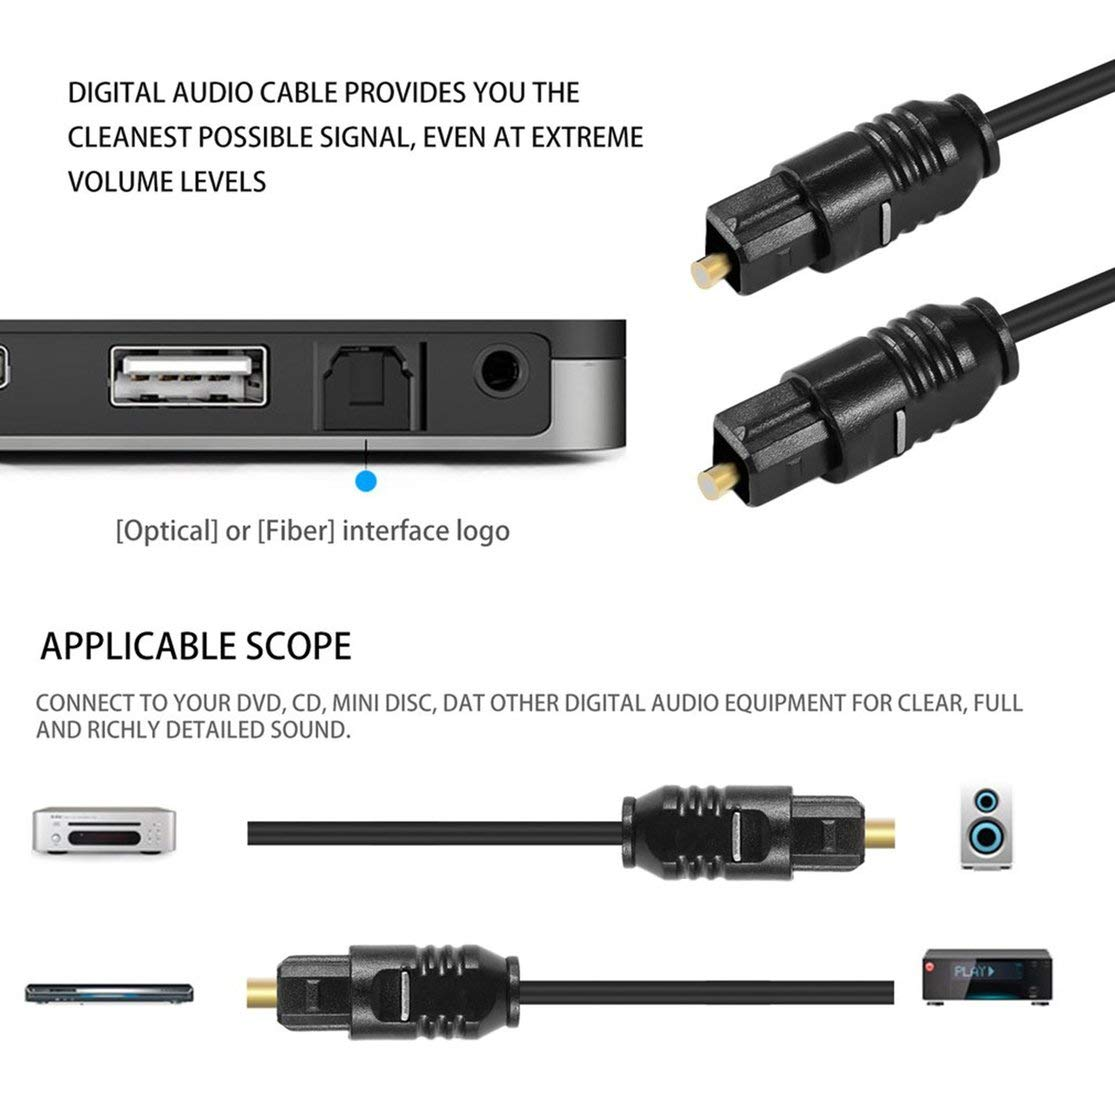 Cables de Audio Digital Cable de conexi/ón Cable de Audio de Fibra /óptica de Fibra /óptica de Fibra /óptica de Fibra /óptica de Fibra /óptica de Fibra /óptica